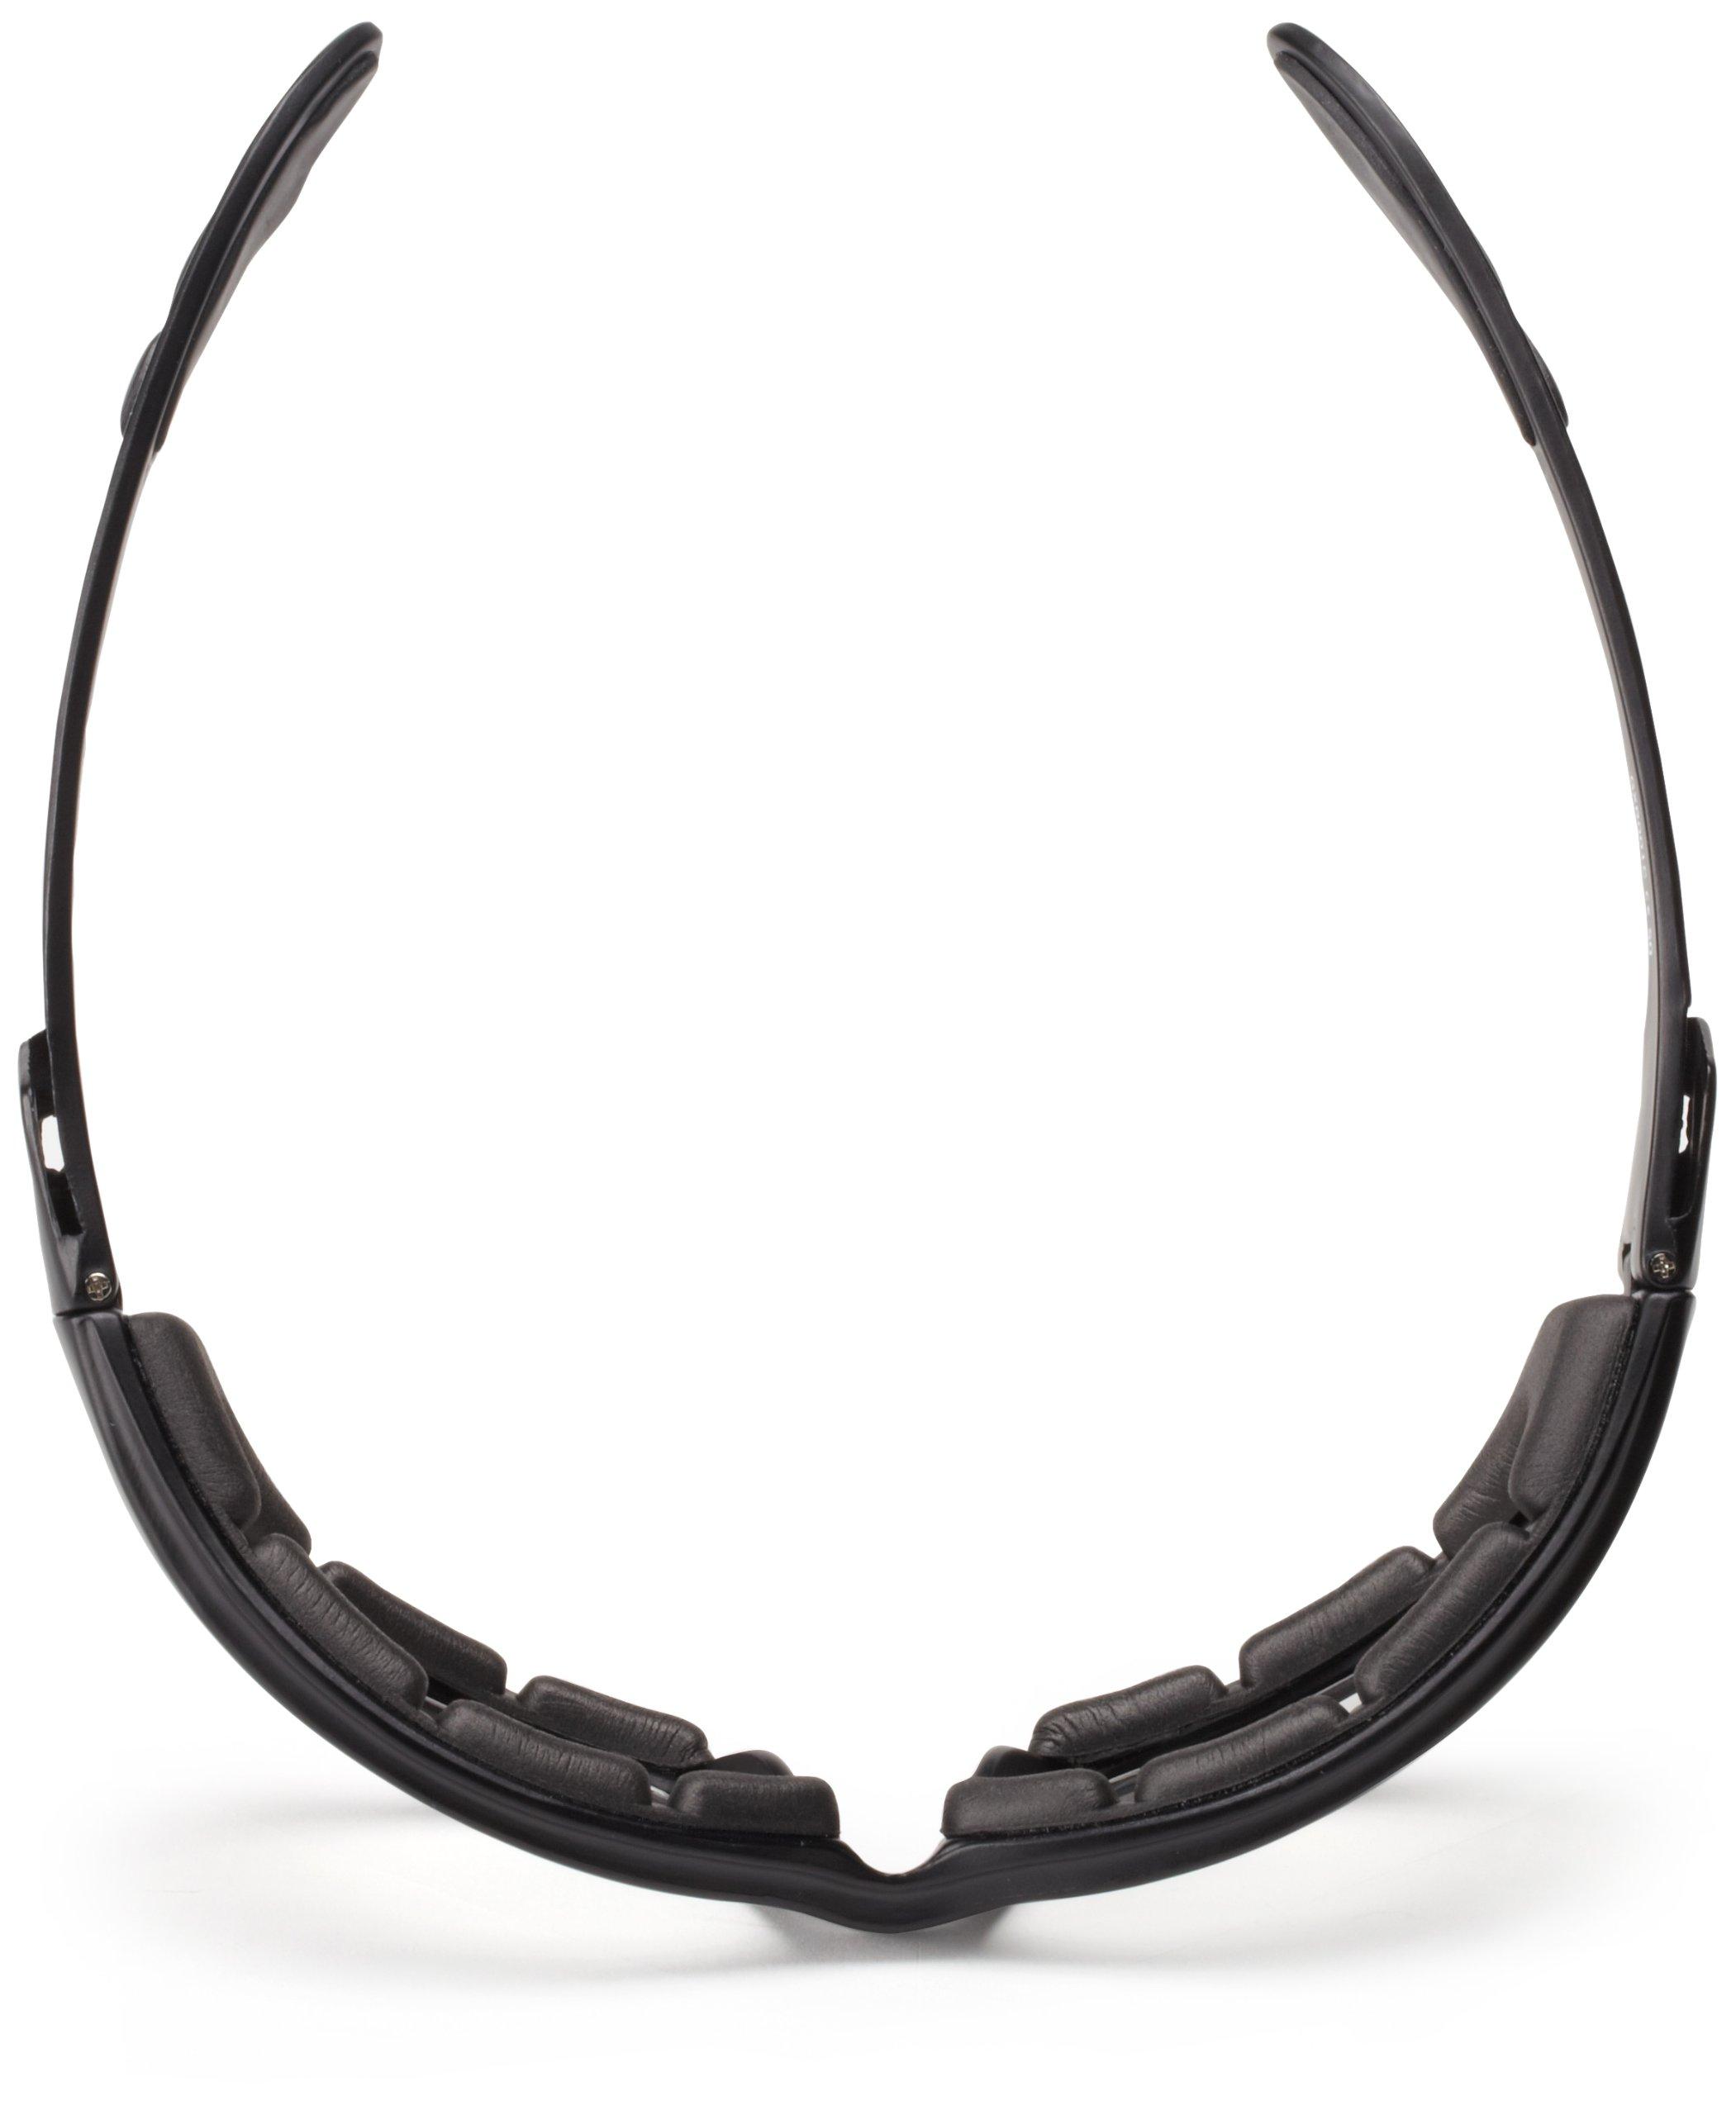 Bobster GXR Sport Sunglasses,Black Frame/Clear Lens,one size by Bobster (Image #5)